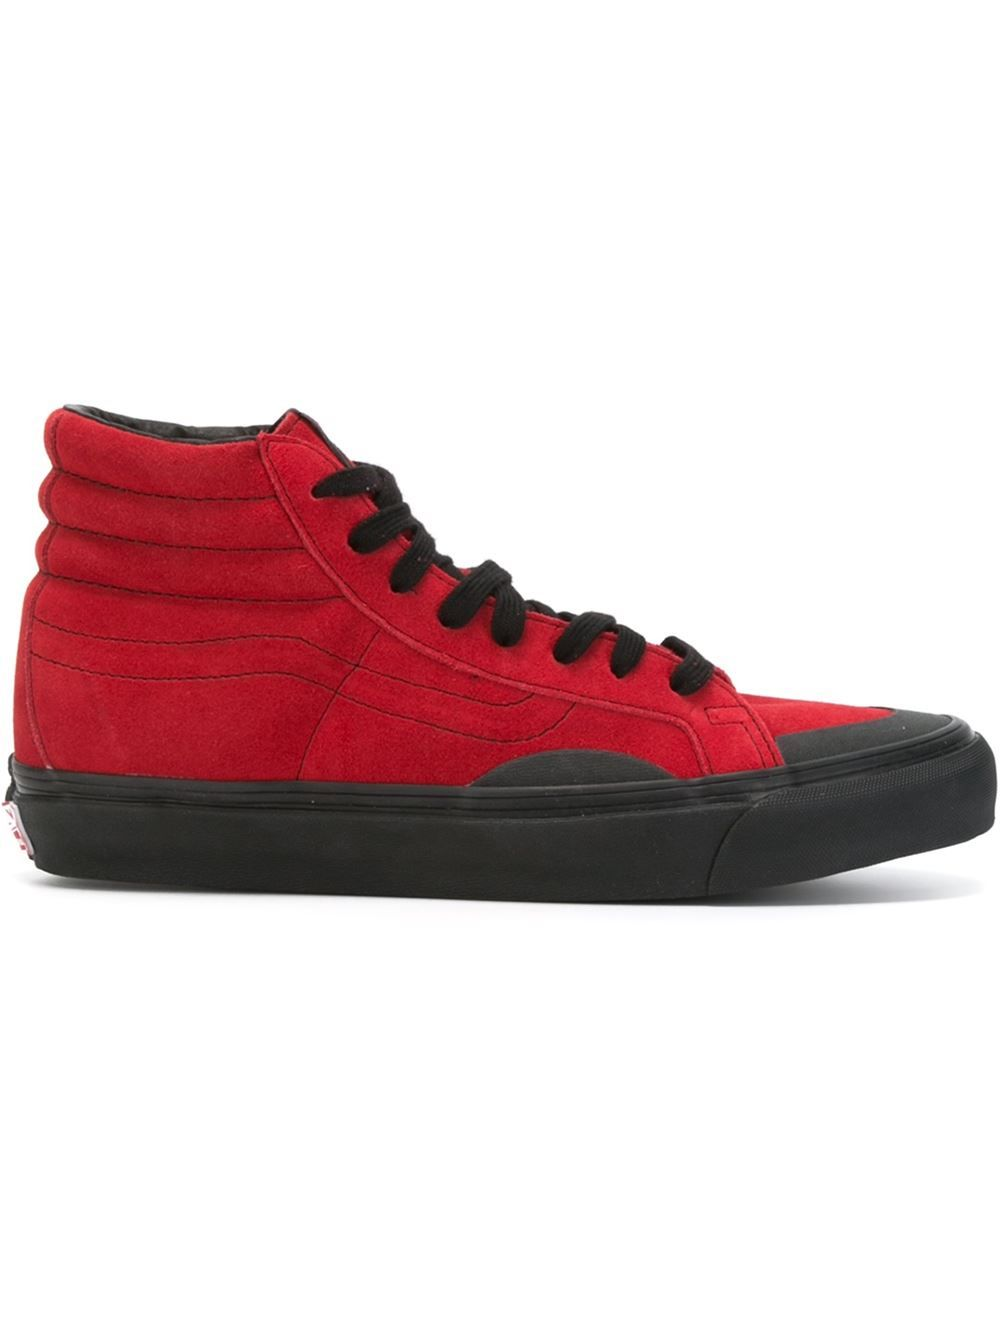 the best attitude 4a16b 67804 Vans Hi-top Sneakers - Wok-store - Farfetch.com